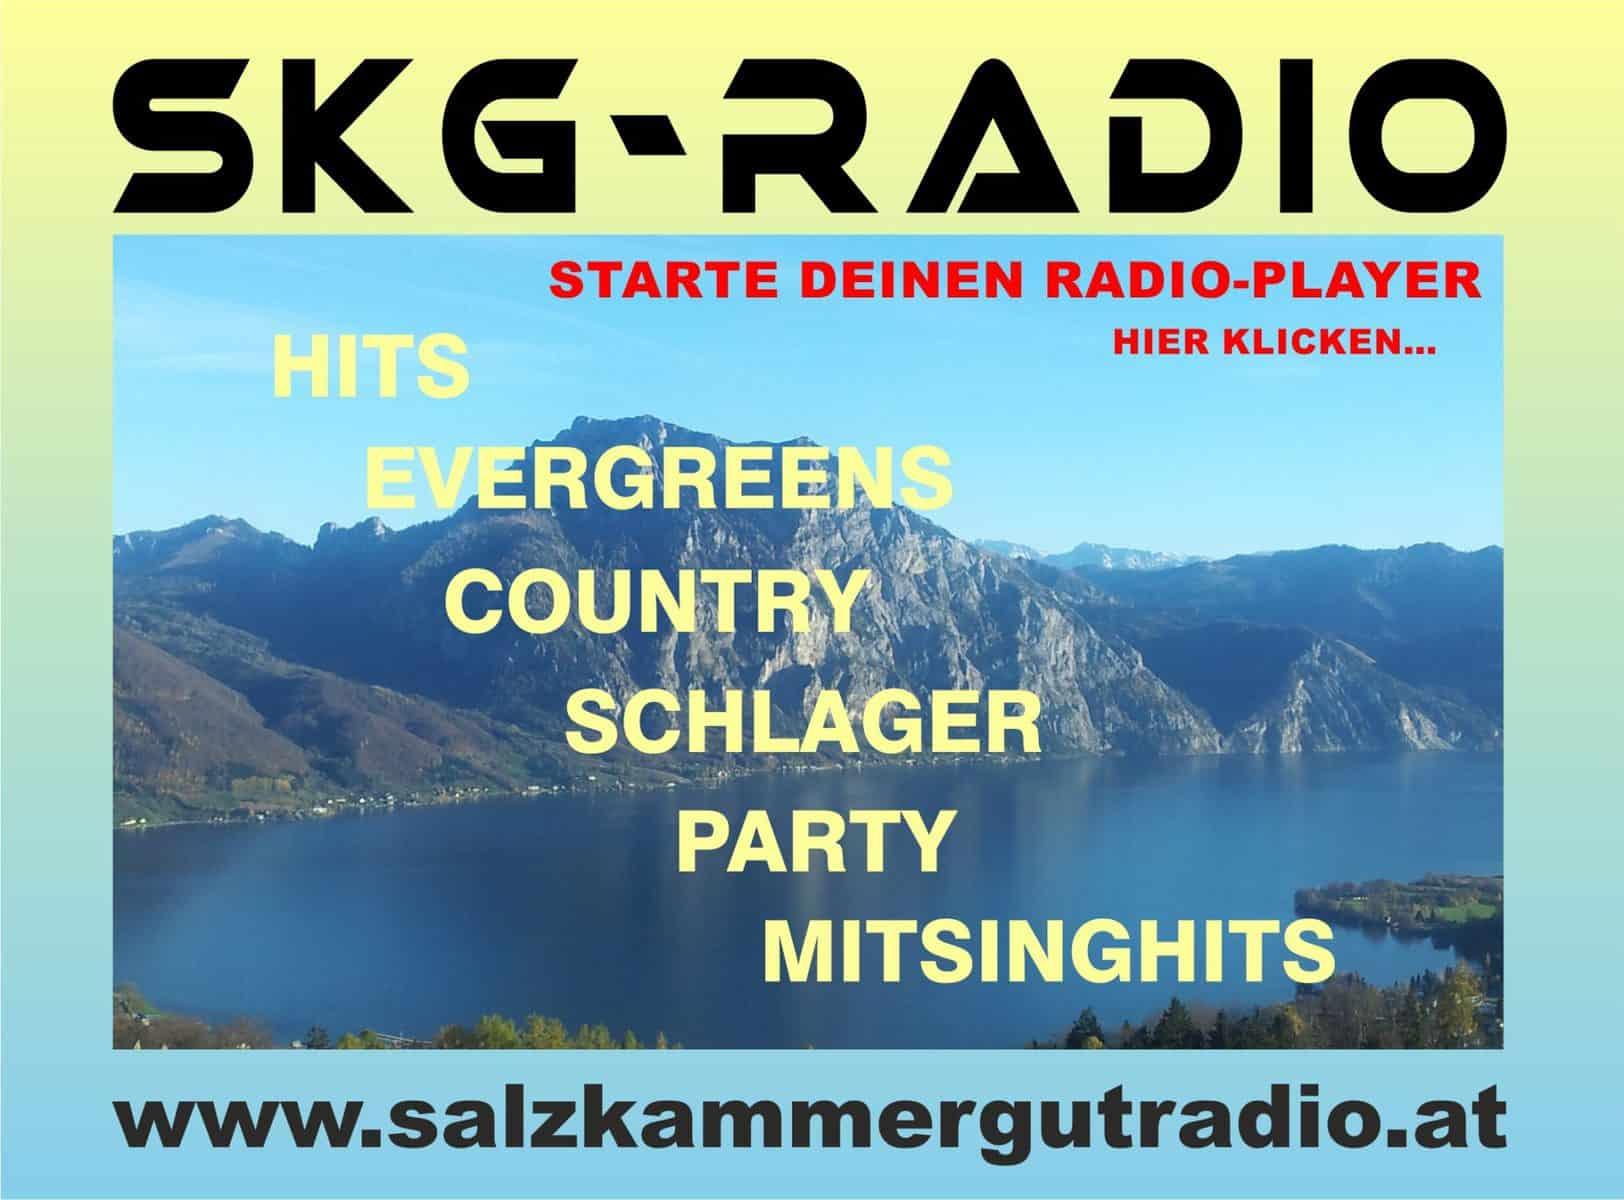 Logo Dein Salzkammergutradio Radioplayer